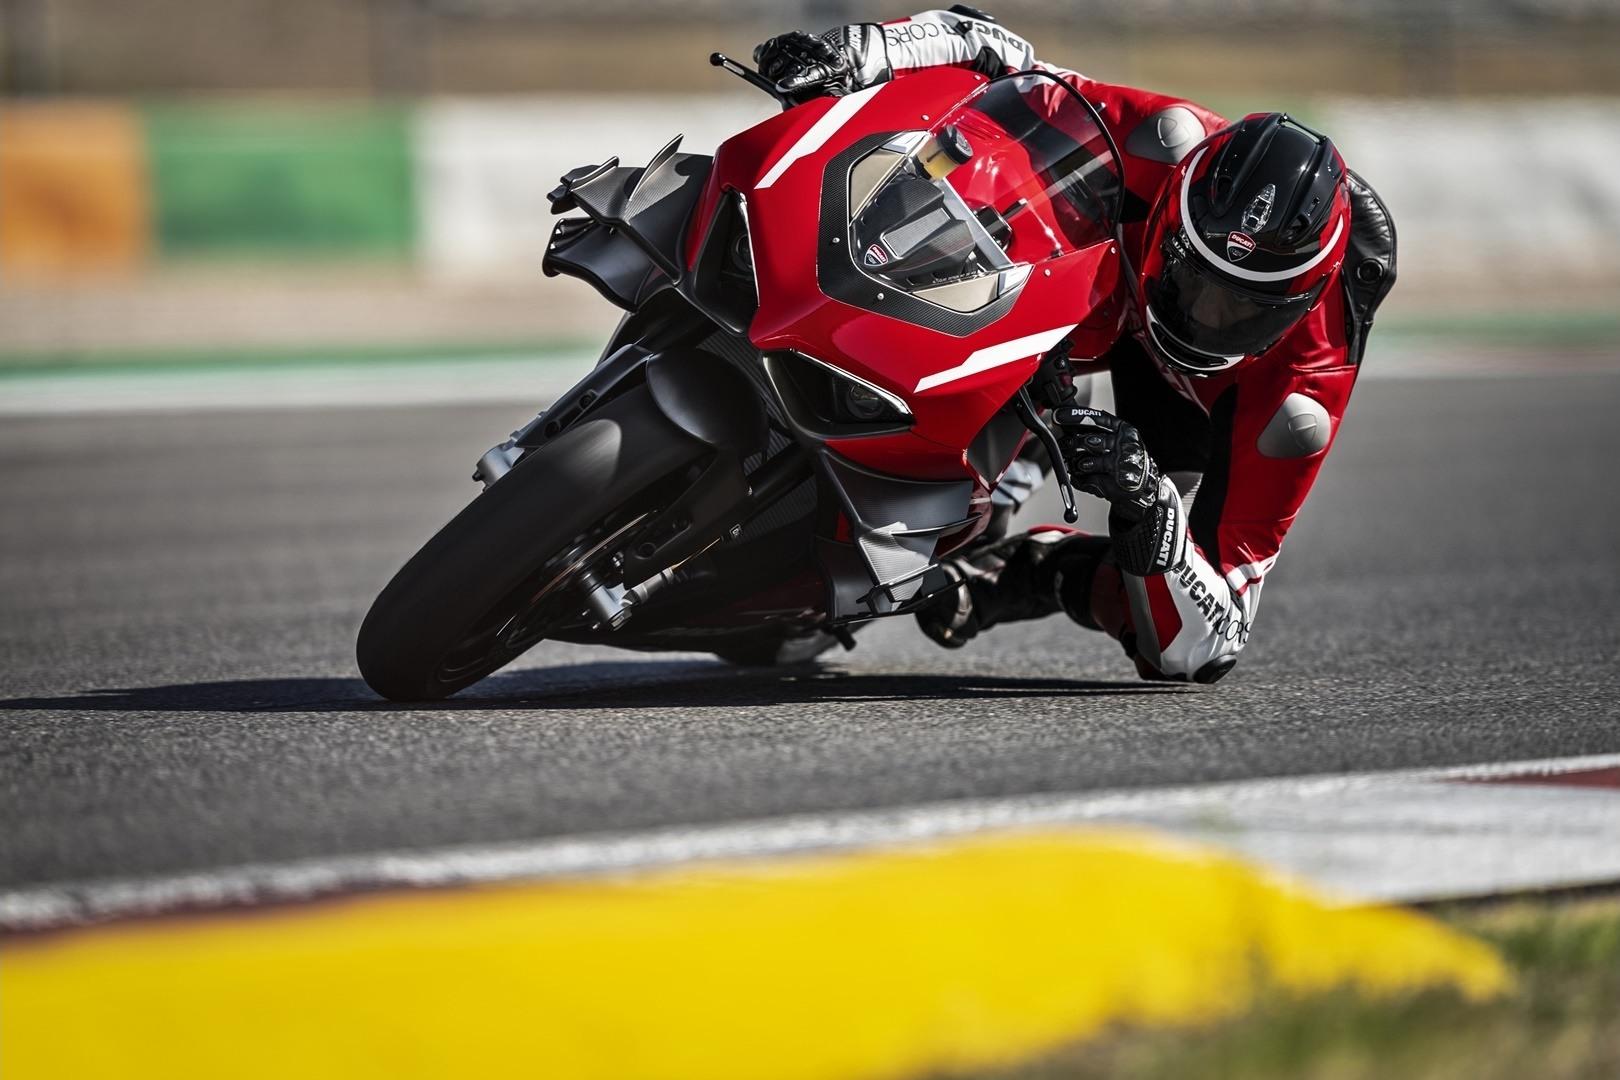 05 Ducati Superleggera V4 Action UC145867 Mid